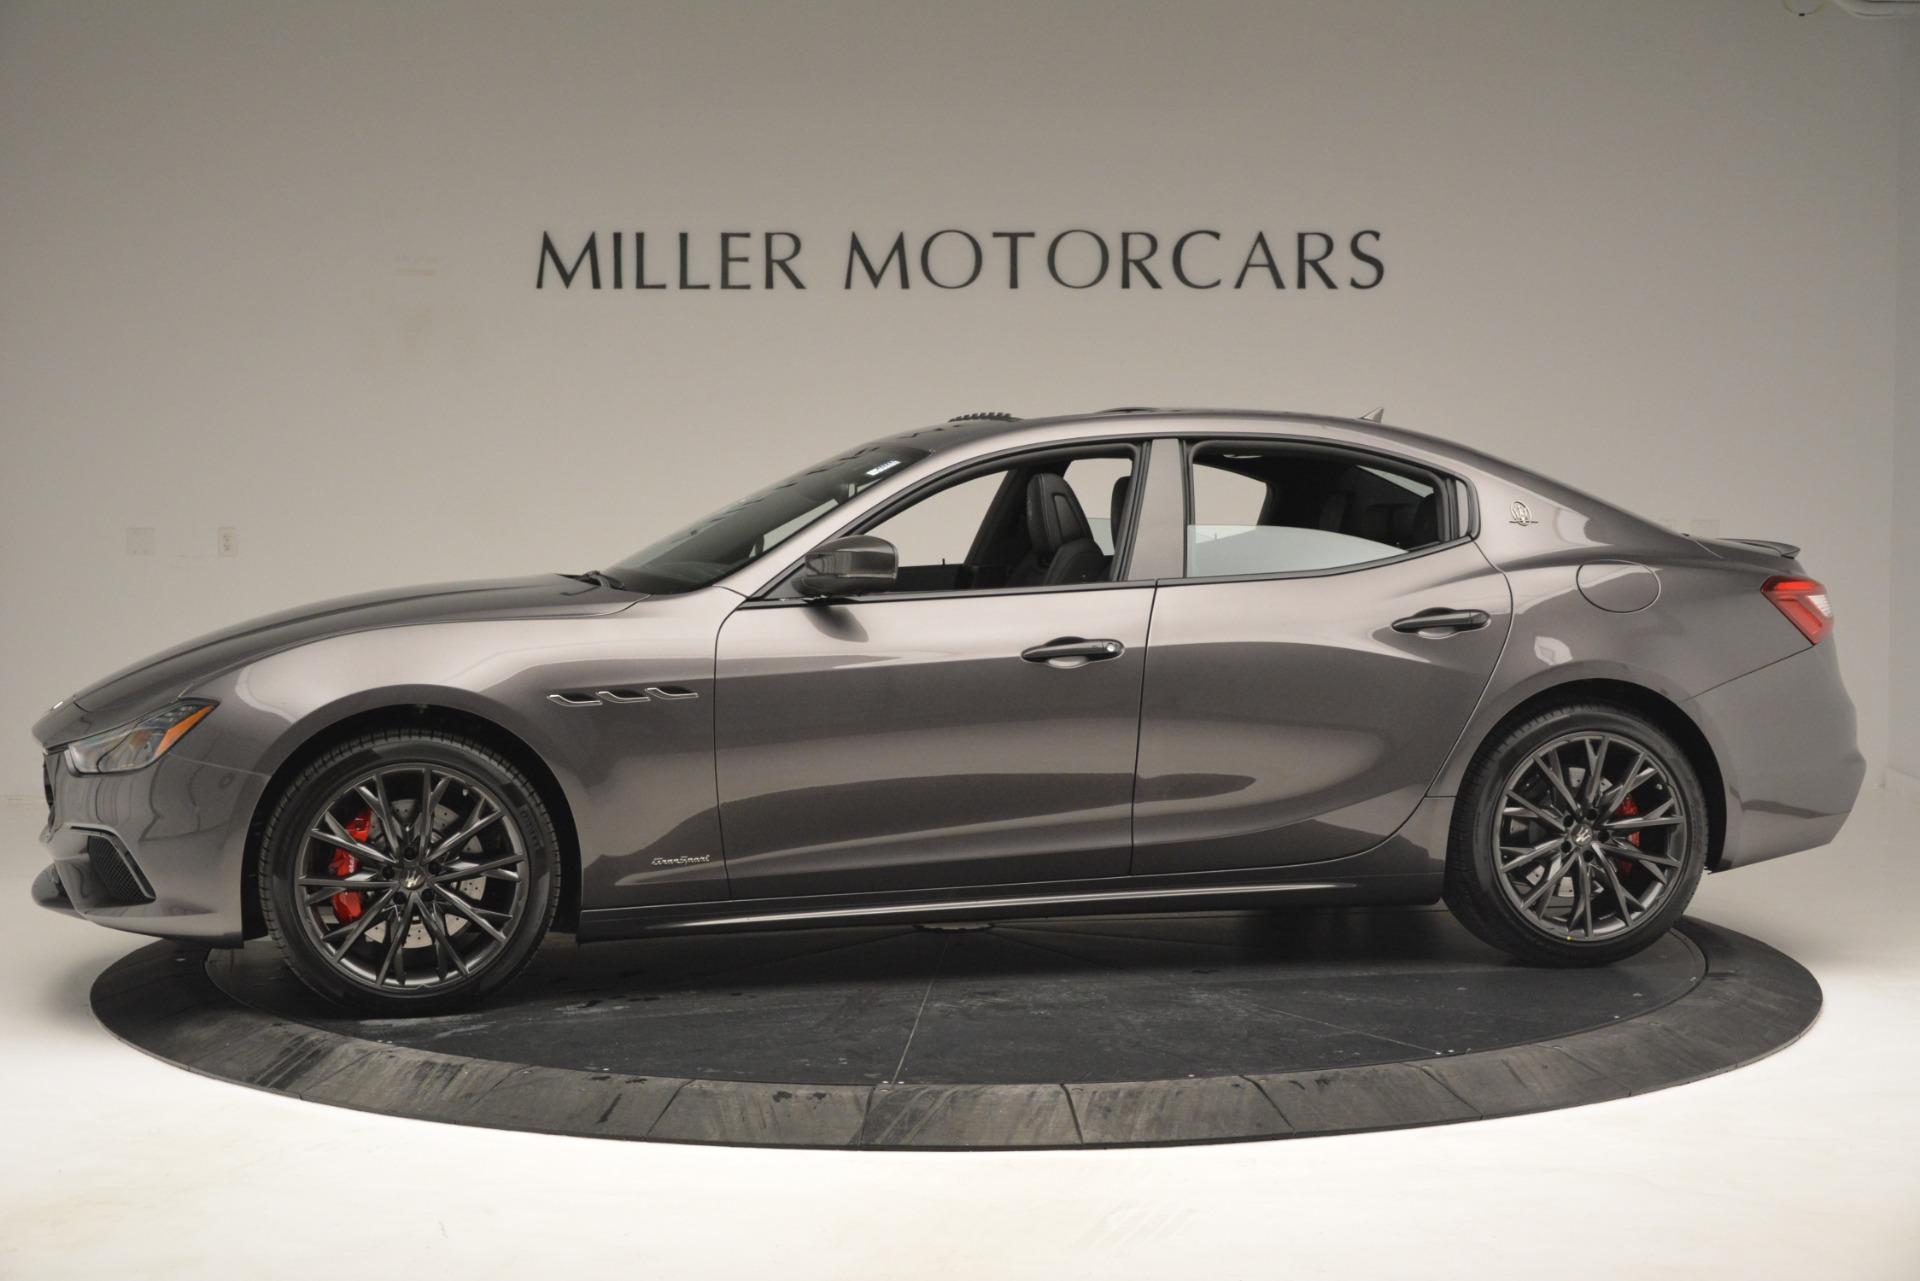 New 2019 Maserati Ghibli S Q4 GranSport For Sale In Greenwich, CT 2925_p3